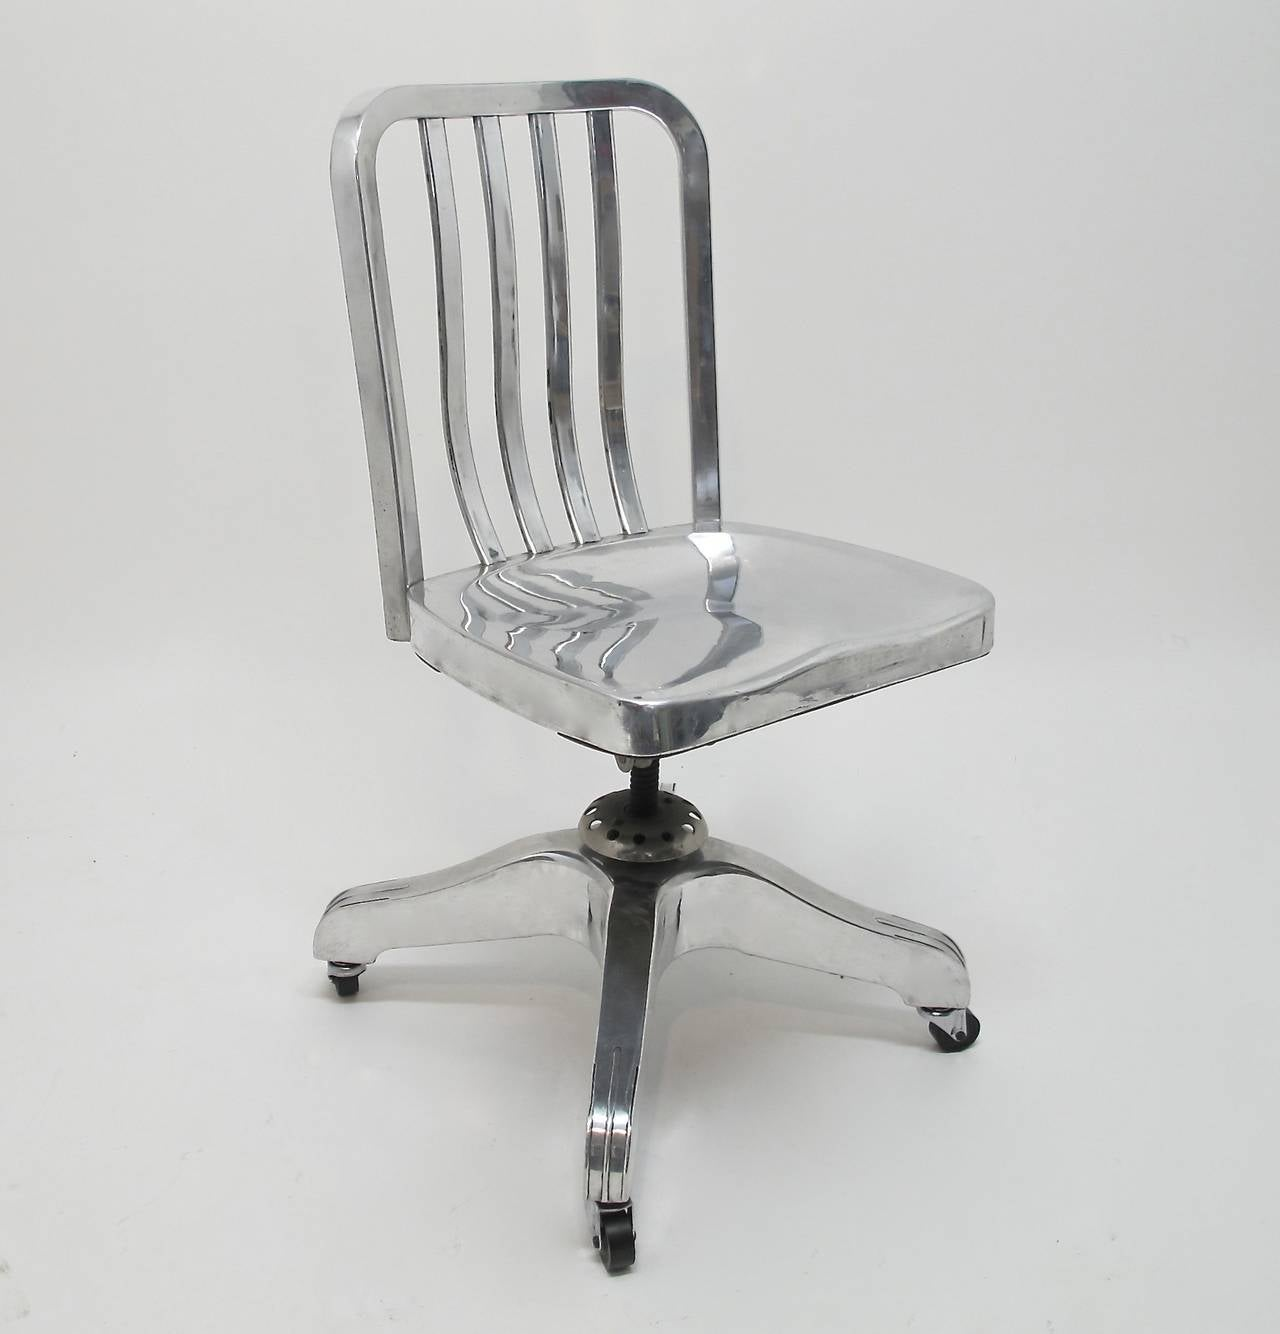 Industrial Aluminum Desk Chair At 1stdibs